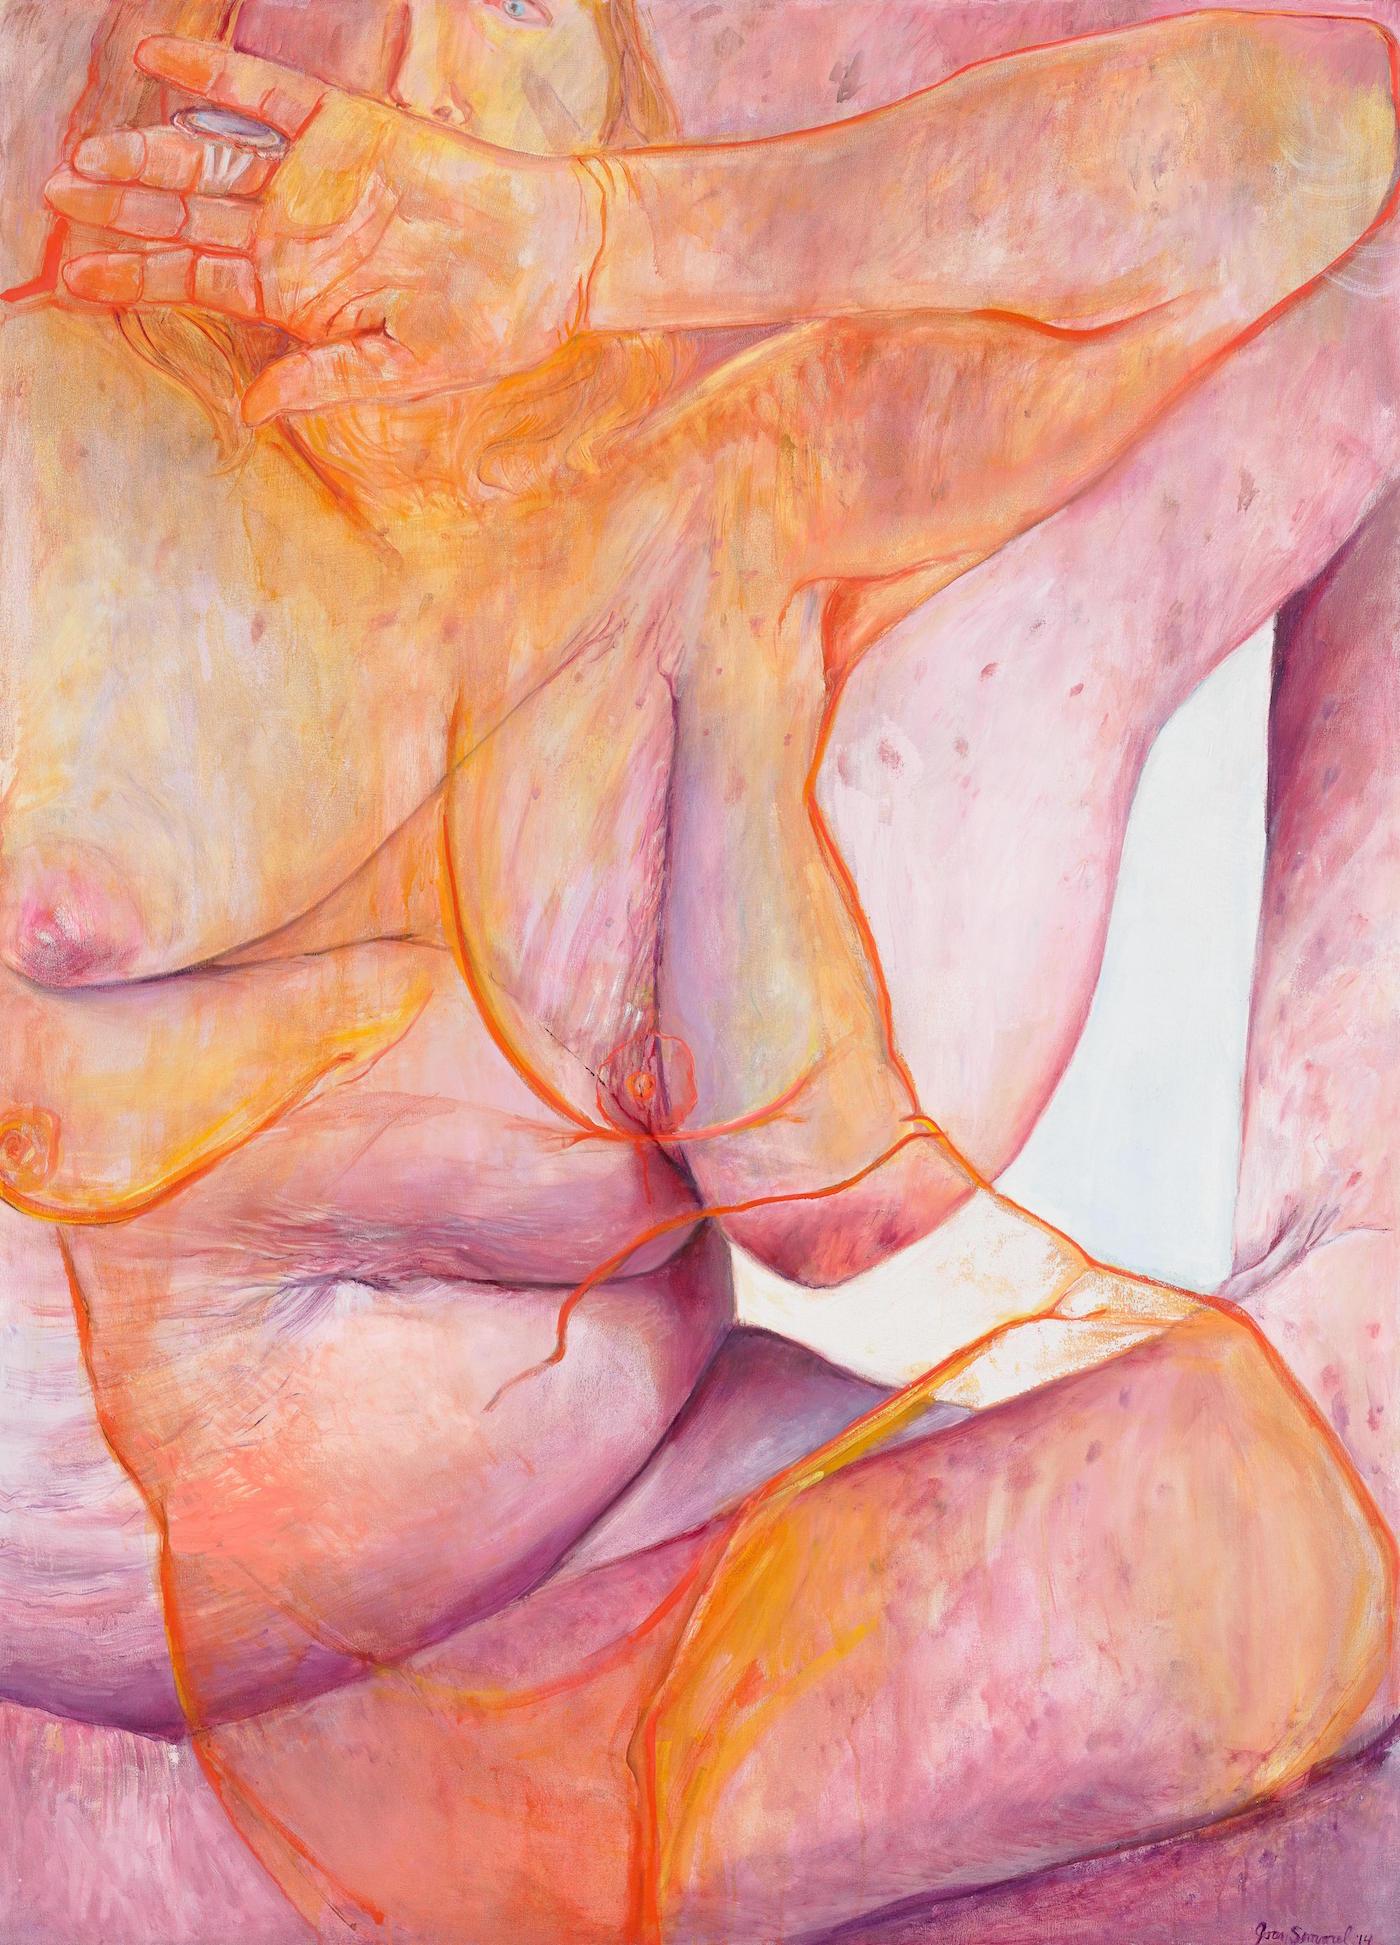 "Joan Semmel, ""Open Hand"" (2015), oil on canvas, 66 x 48 in (courtesy Alexander Gray Associates, New York; © Joan Semmel/Artists Rights Society [ARS], New York)"